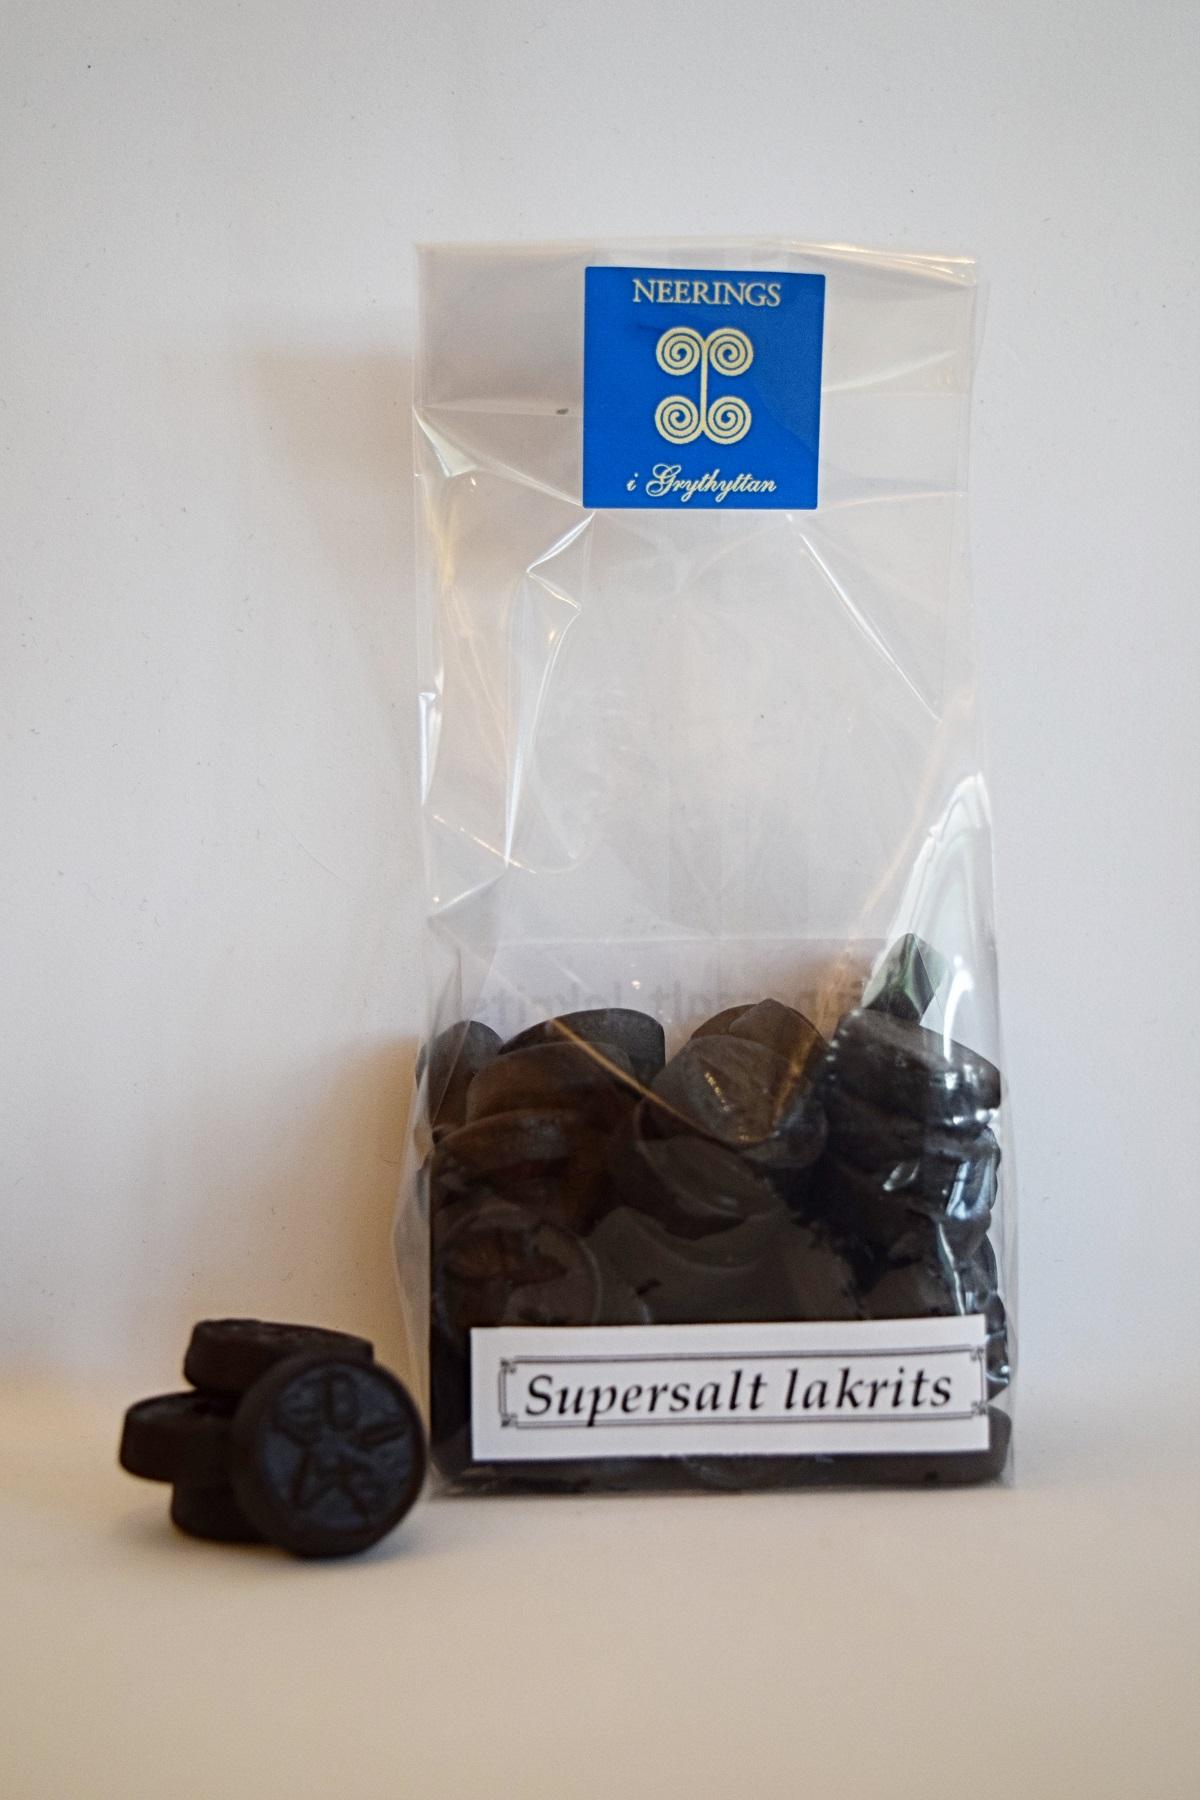 Supersalt lakrits